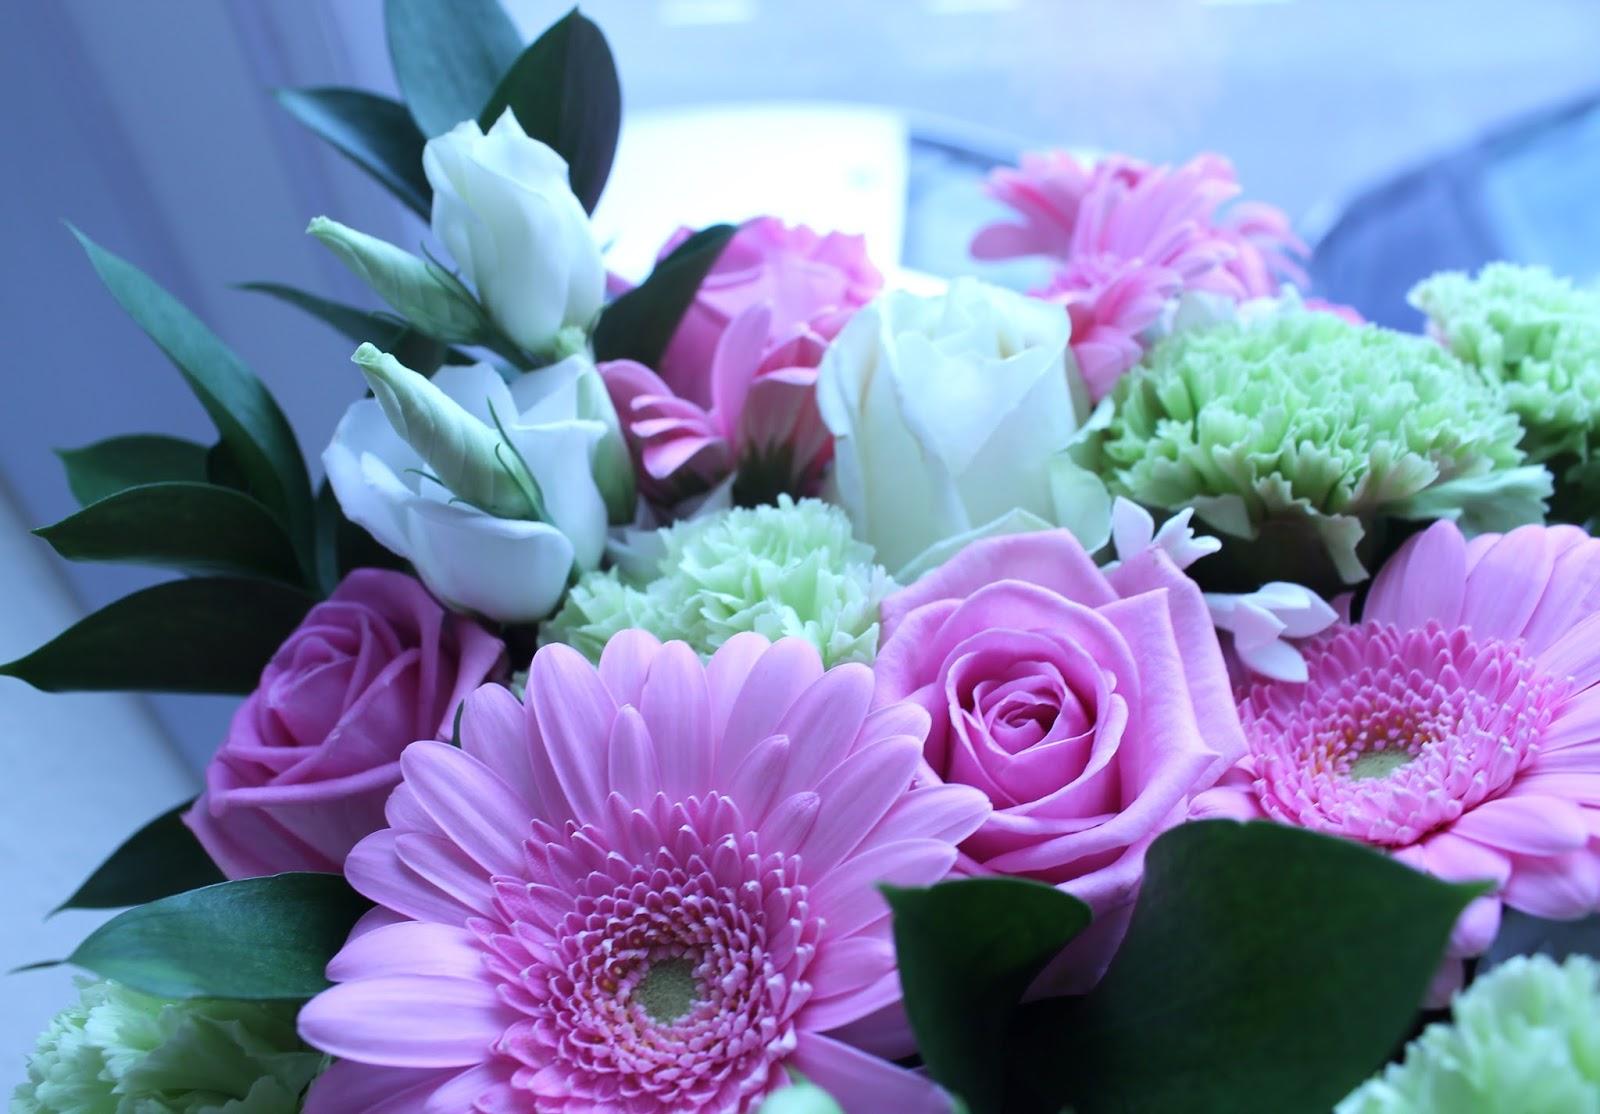 A Sneak Peak Of My New Home And Debenhams Flowers Reader Discount